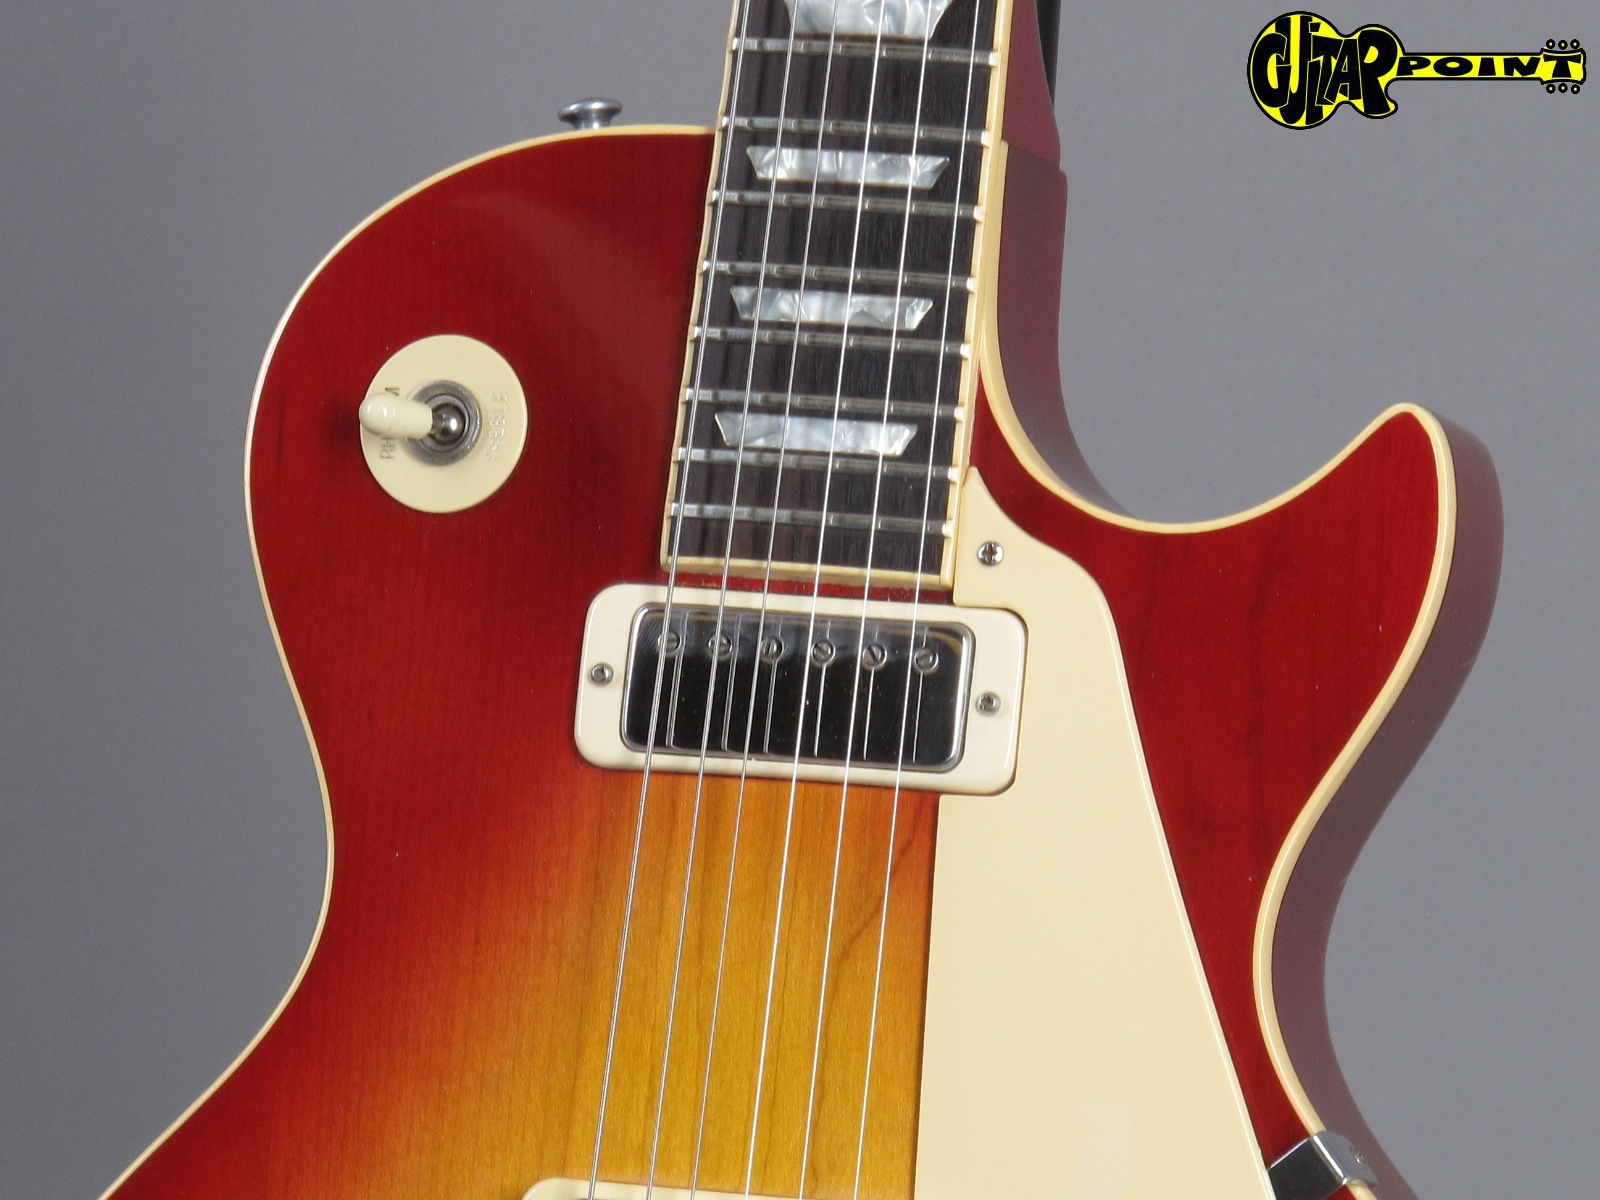 https://guitarpoint.de/app/uploads/products/1981-gibson-les-paul-deluxe-cherry-sunburst/Gibson81LPDLCSB83171536_5.jpg